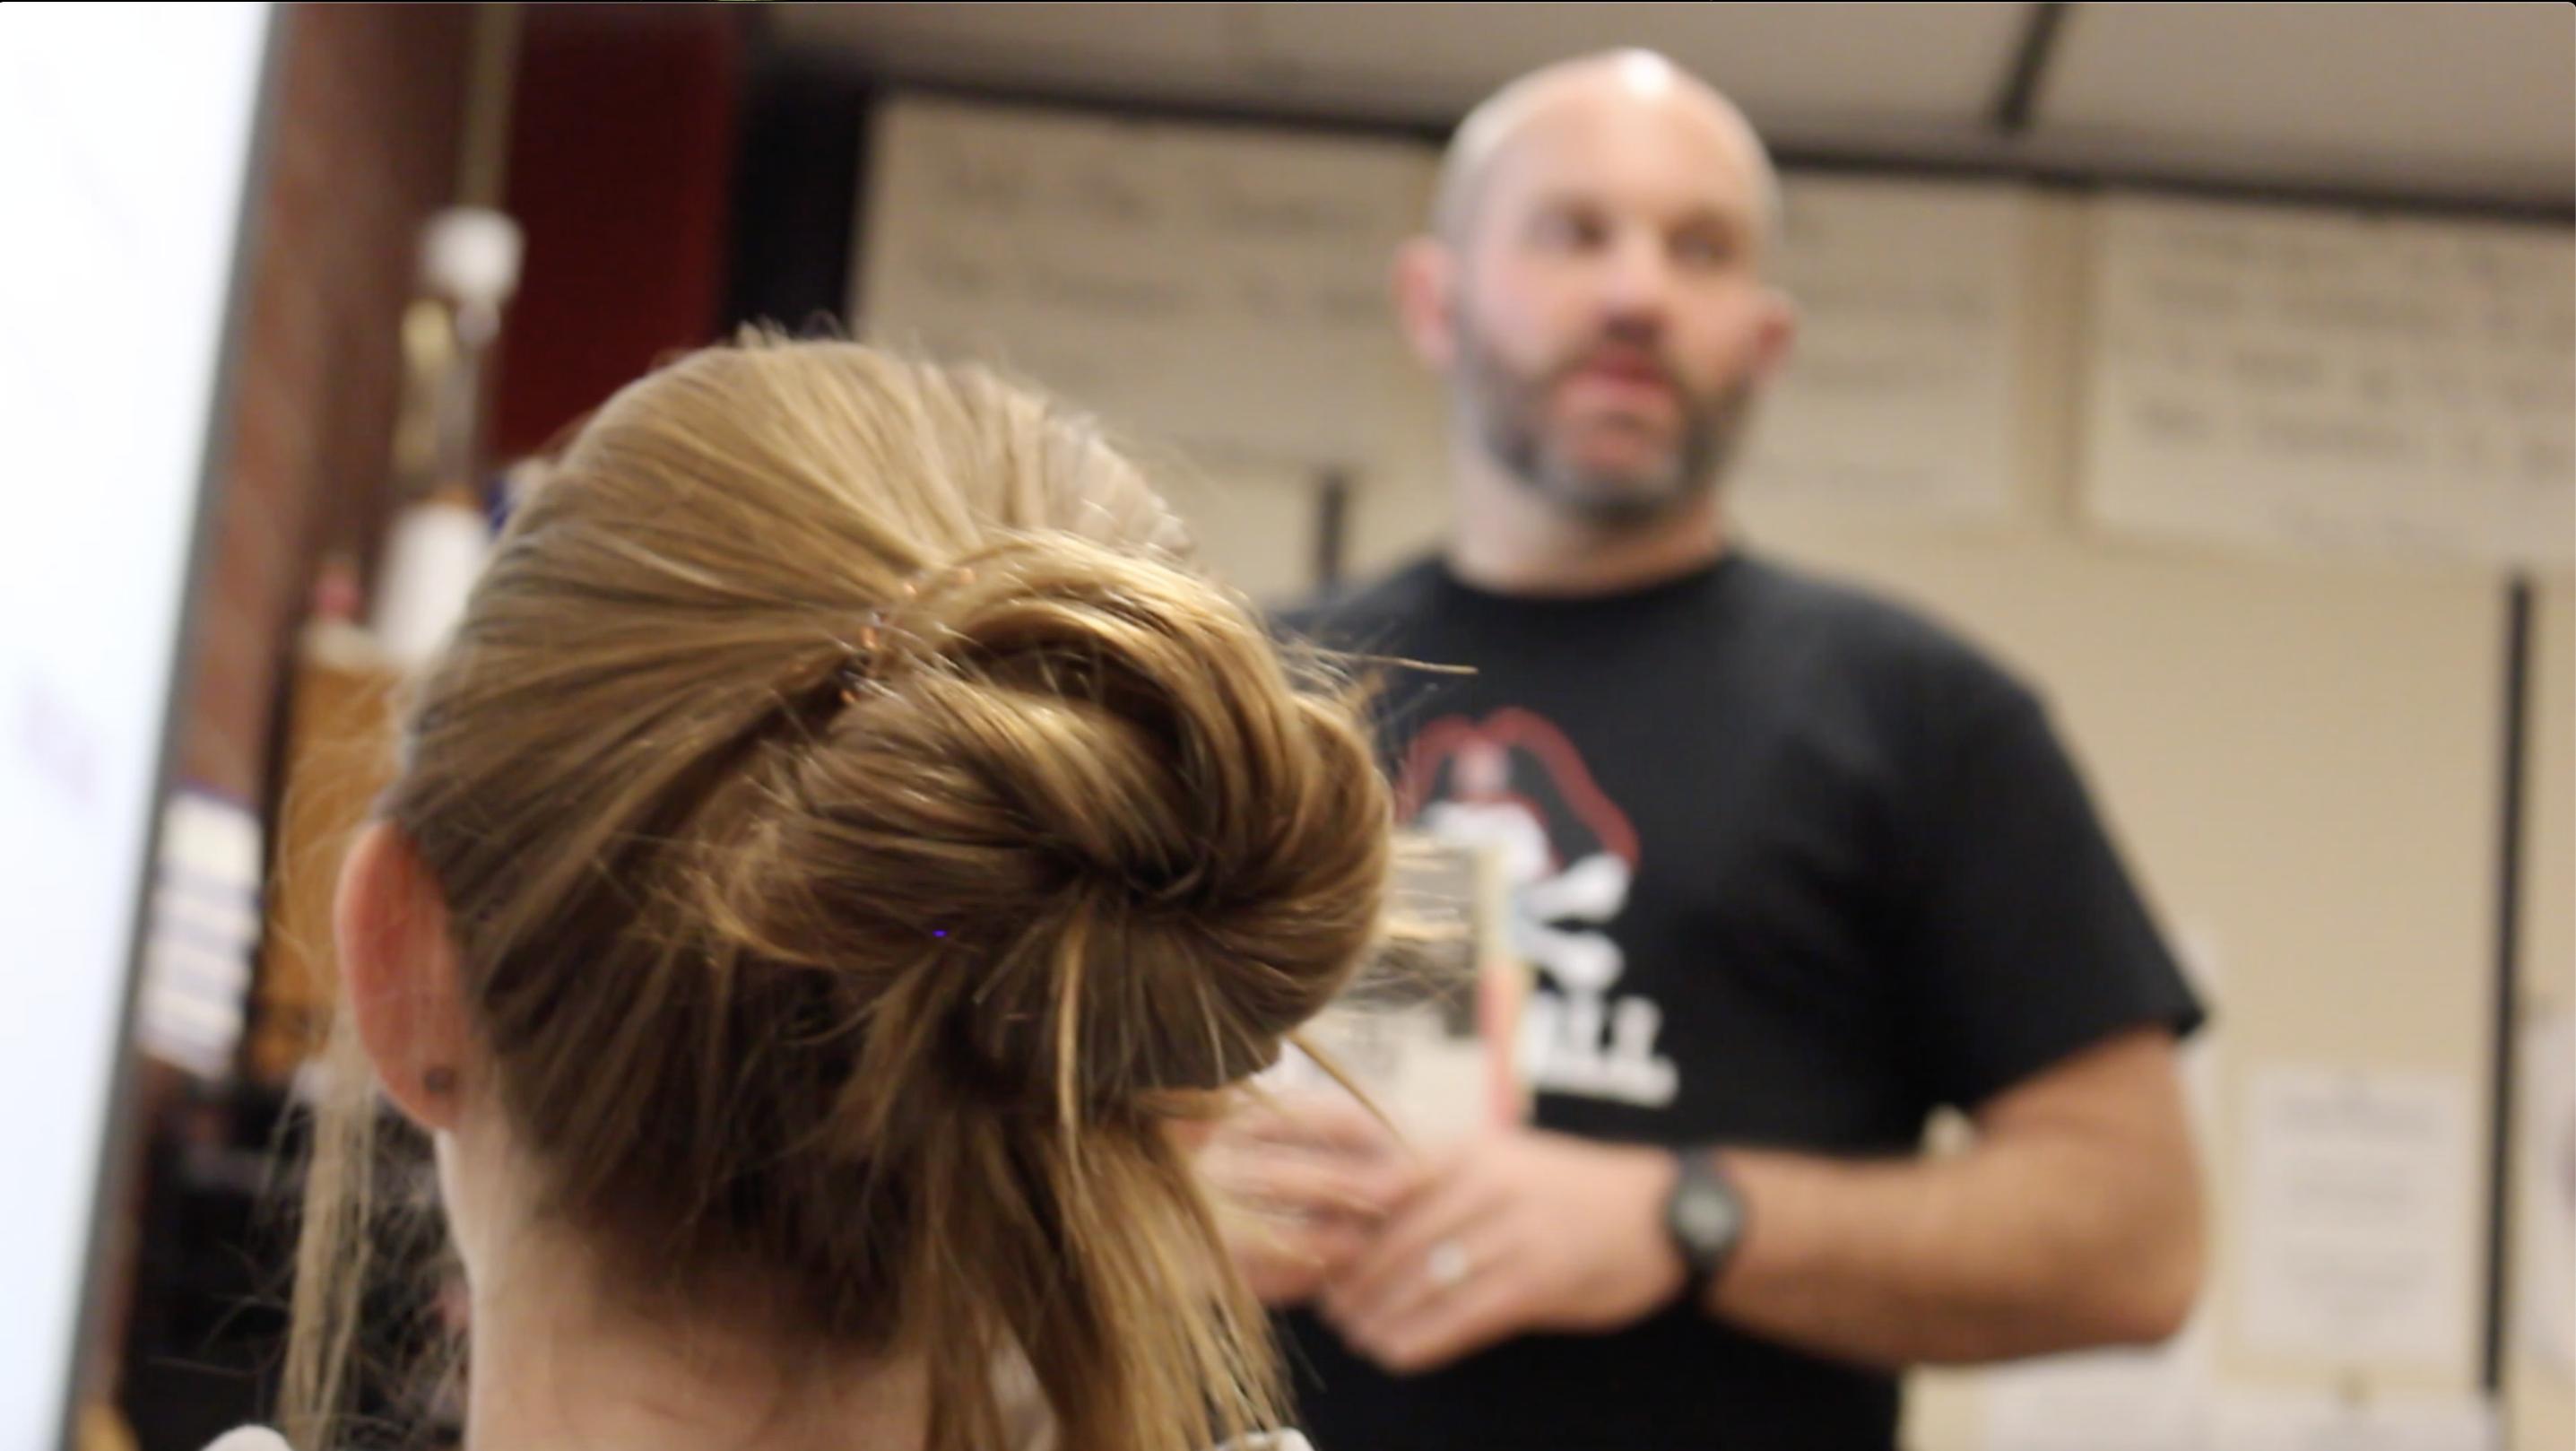 Video: The new English teacher: Mr. Oulman